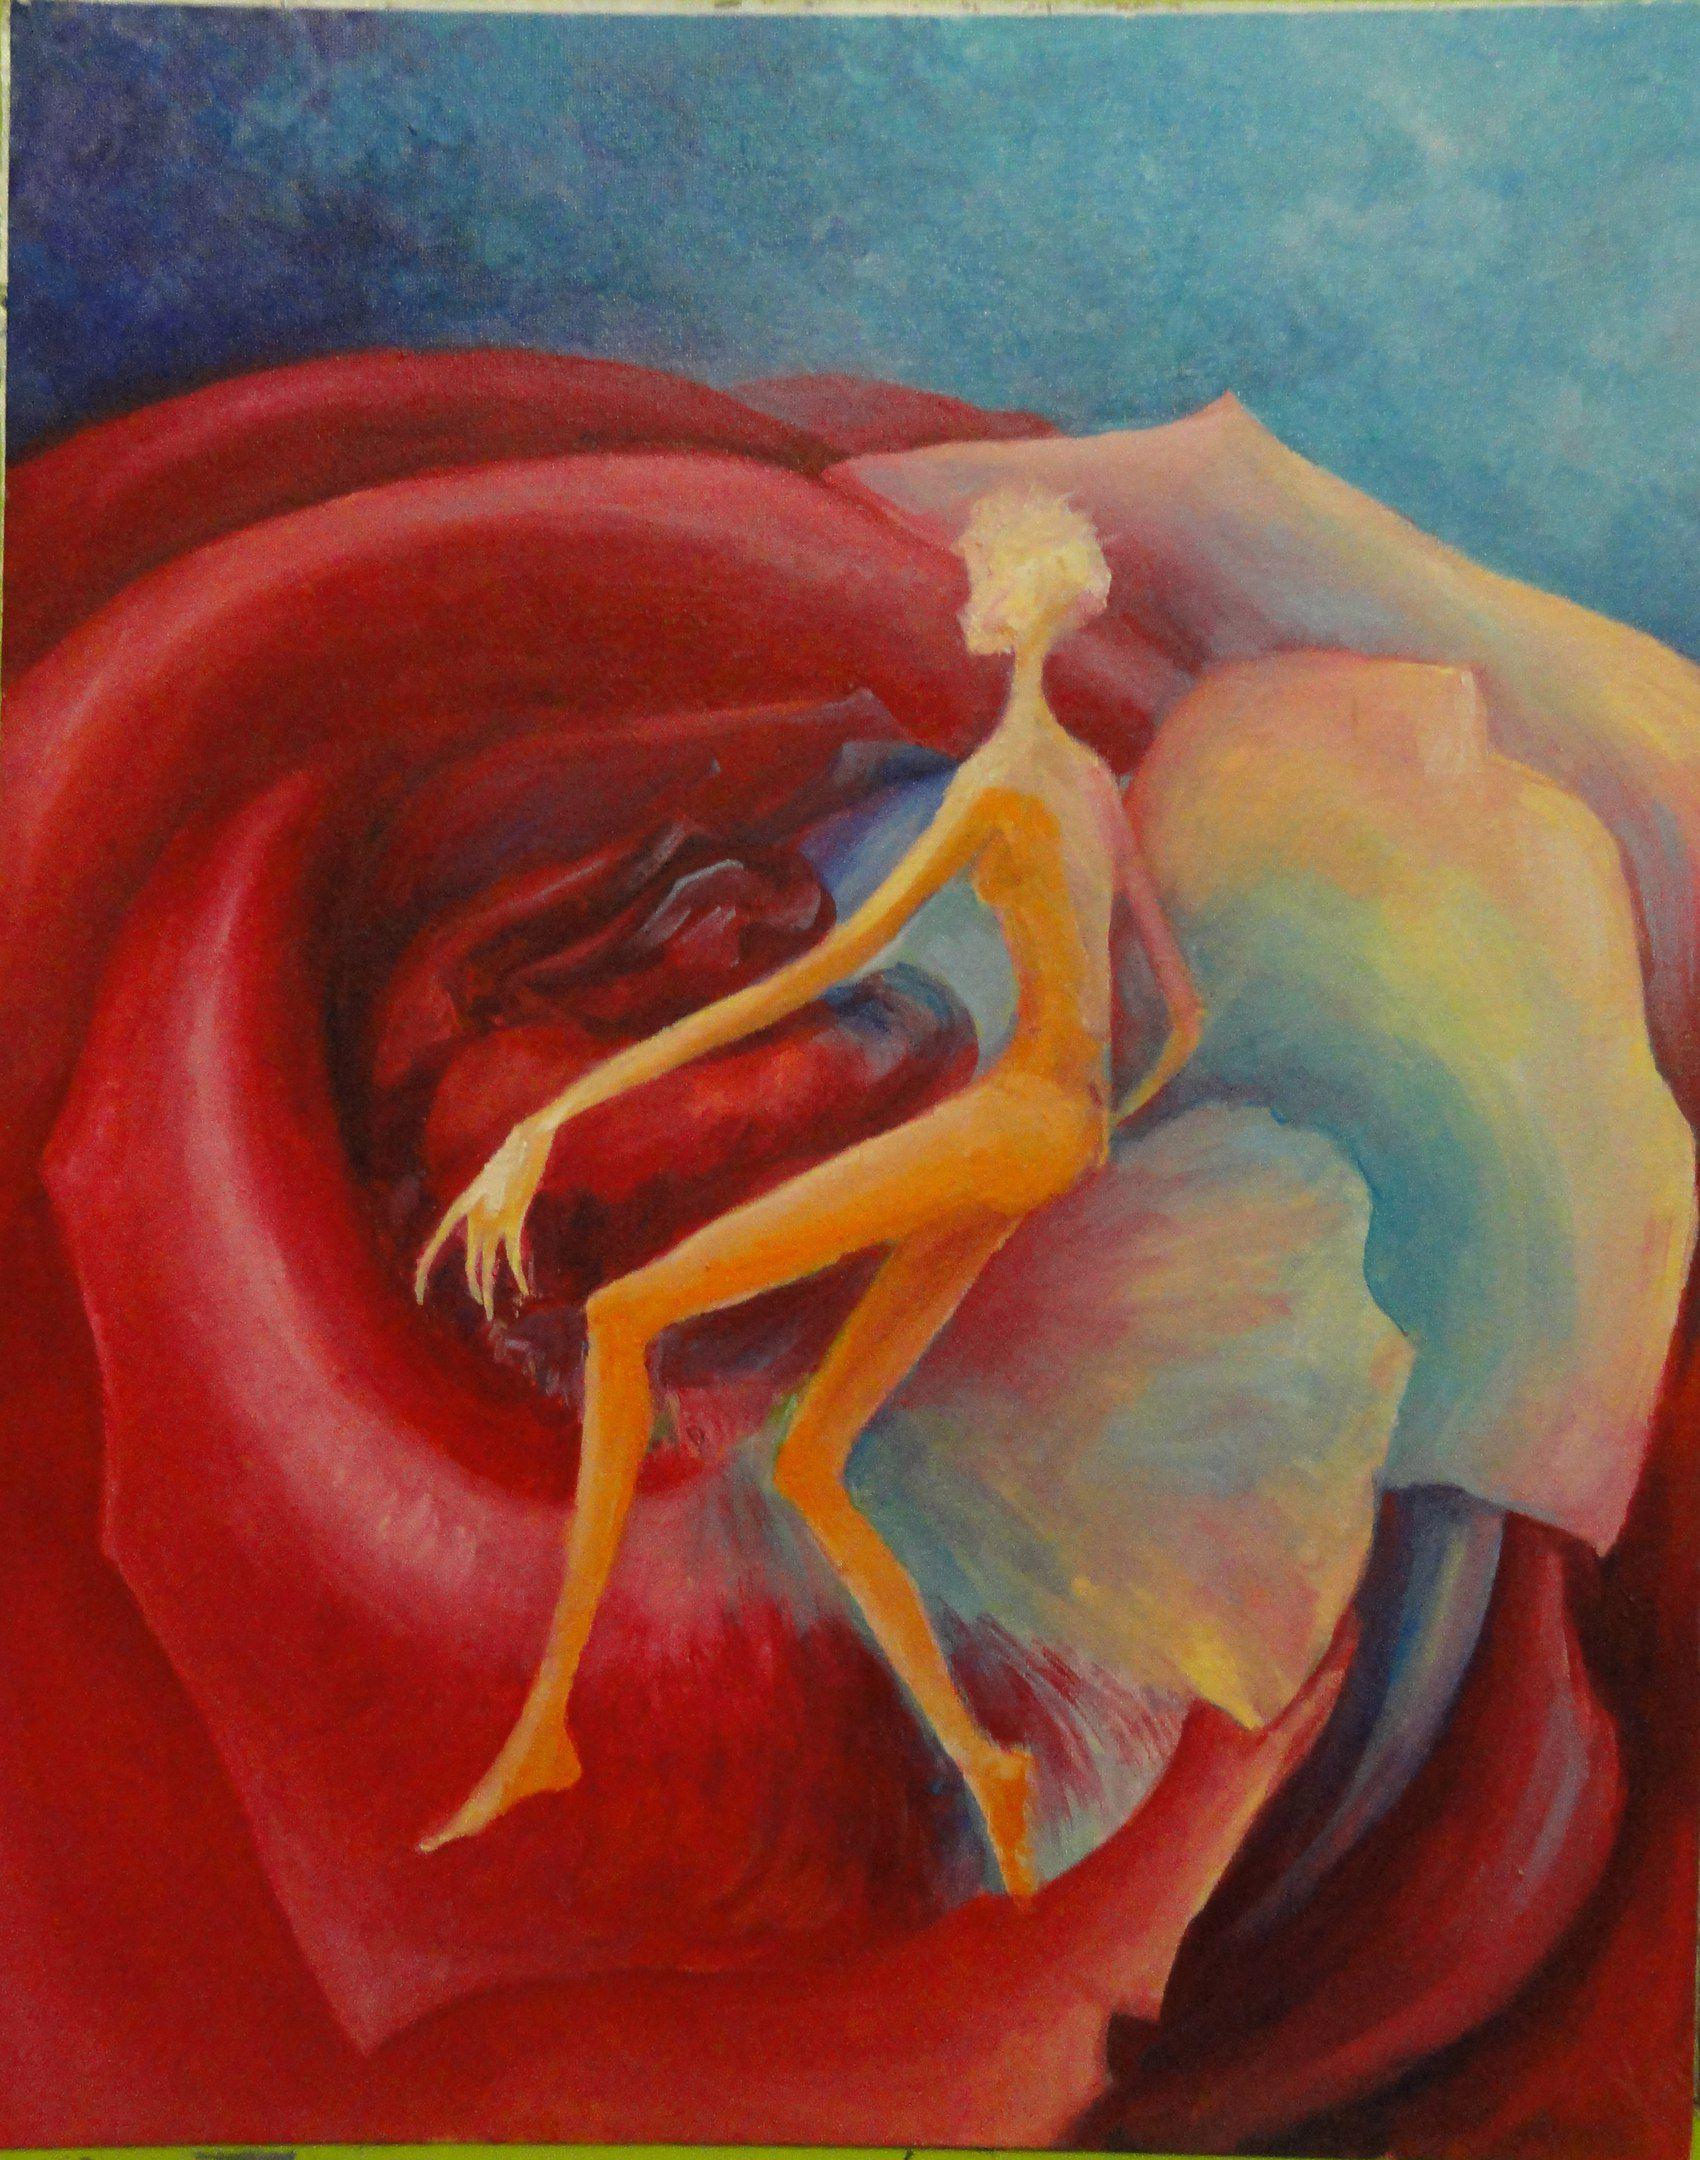 красиво роза живопись фантазия масло картина арт холст